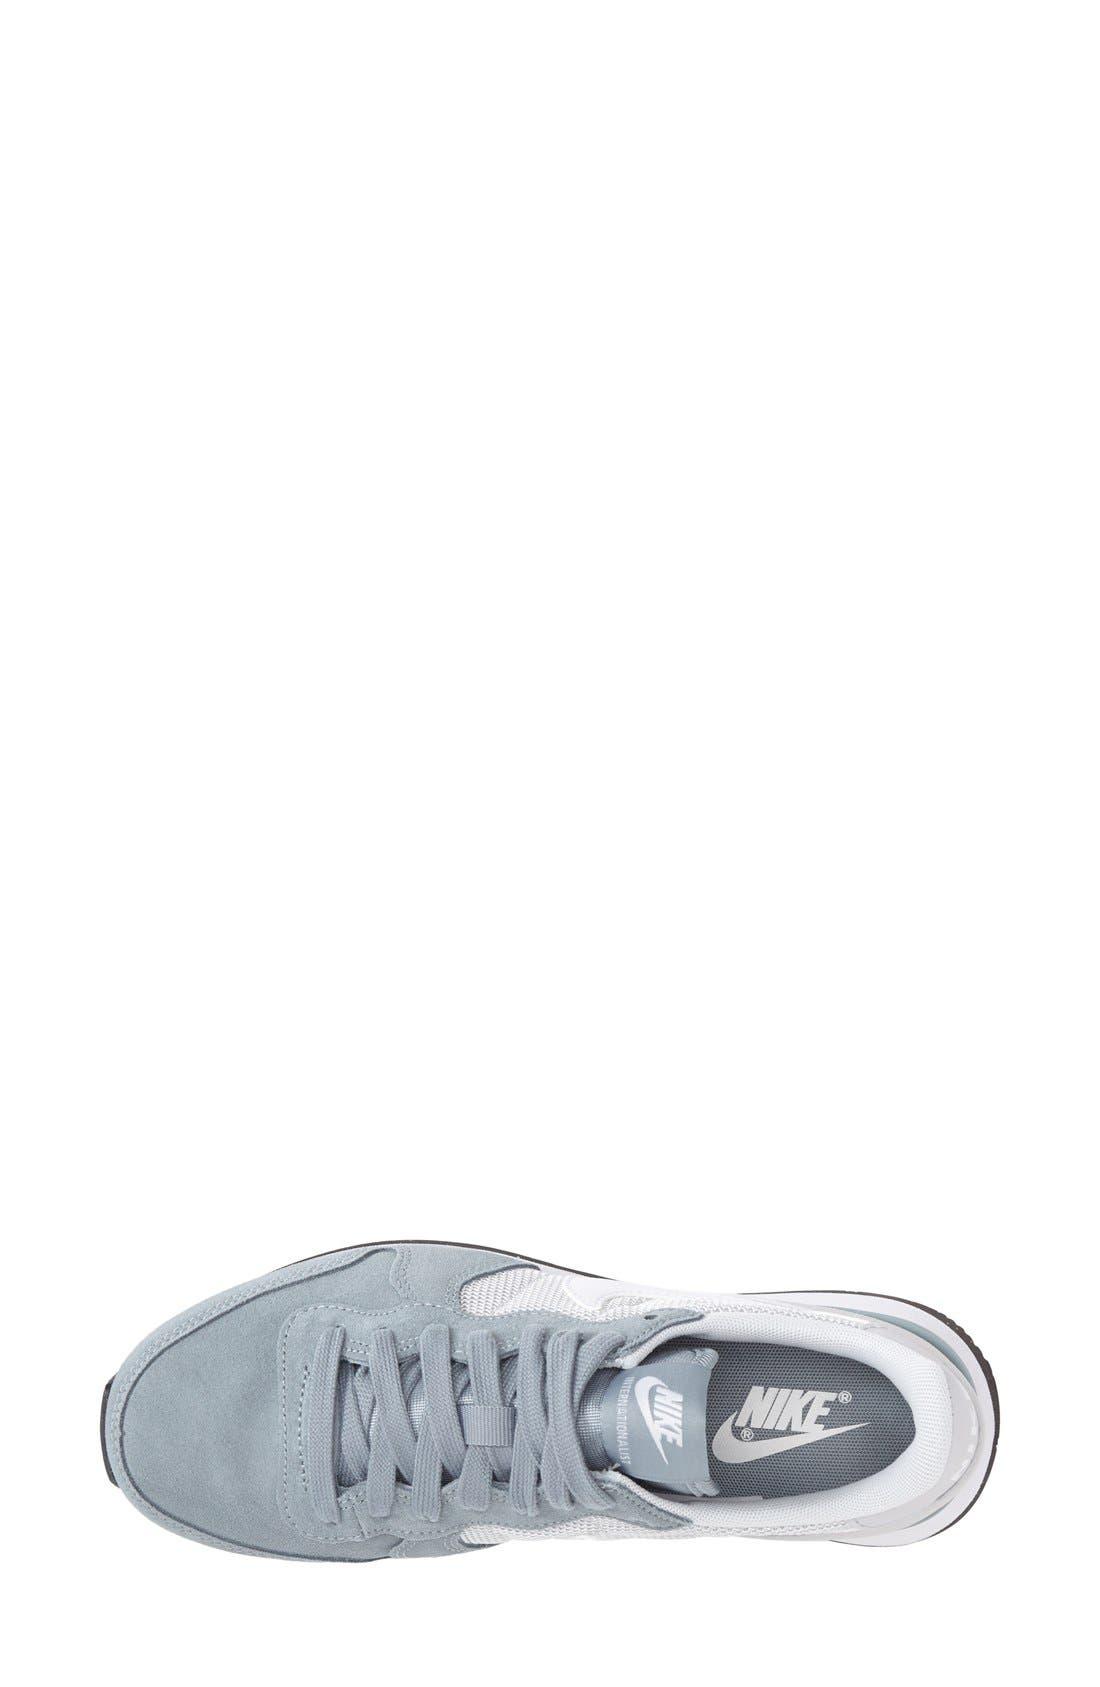 'Internationalist' Sneaker,                             Alternate thumbnail 3, color,                             Grey/ Platinum/ Black